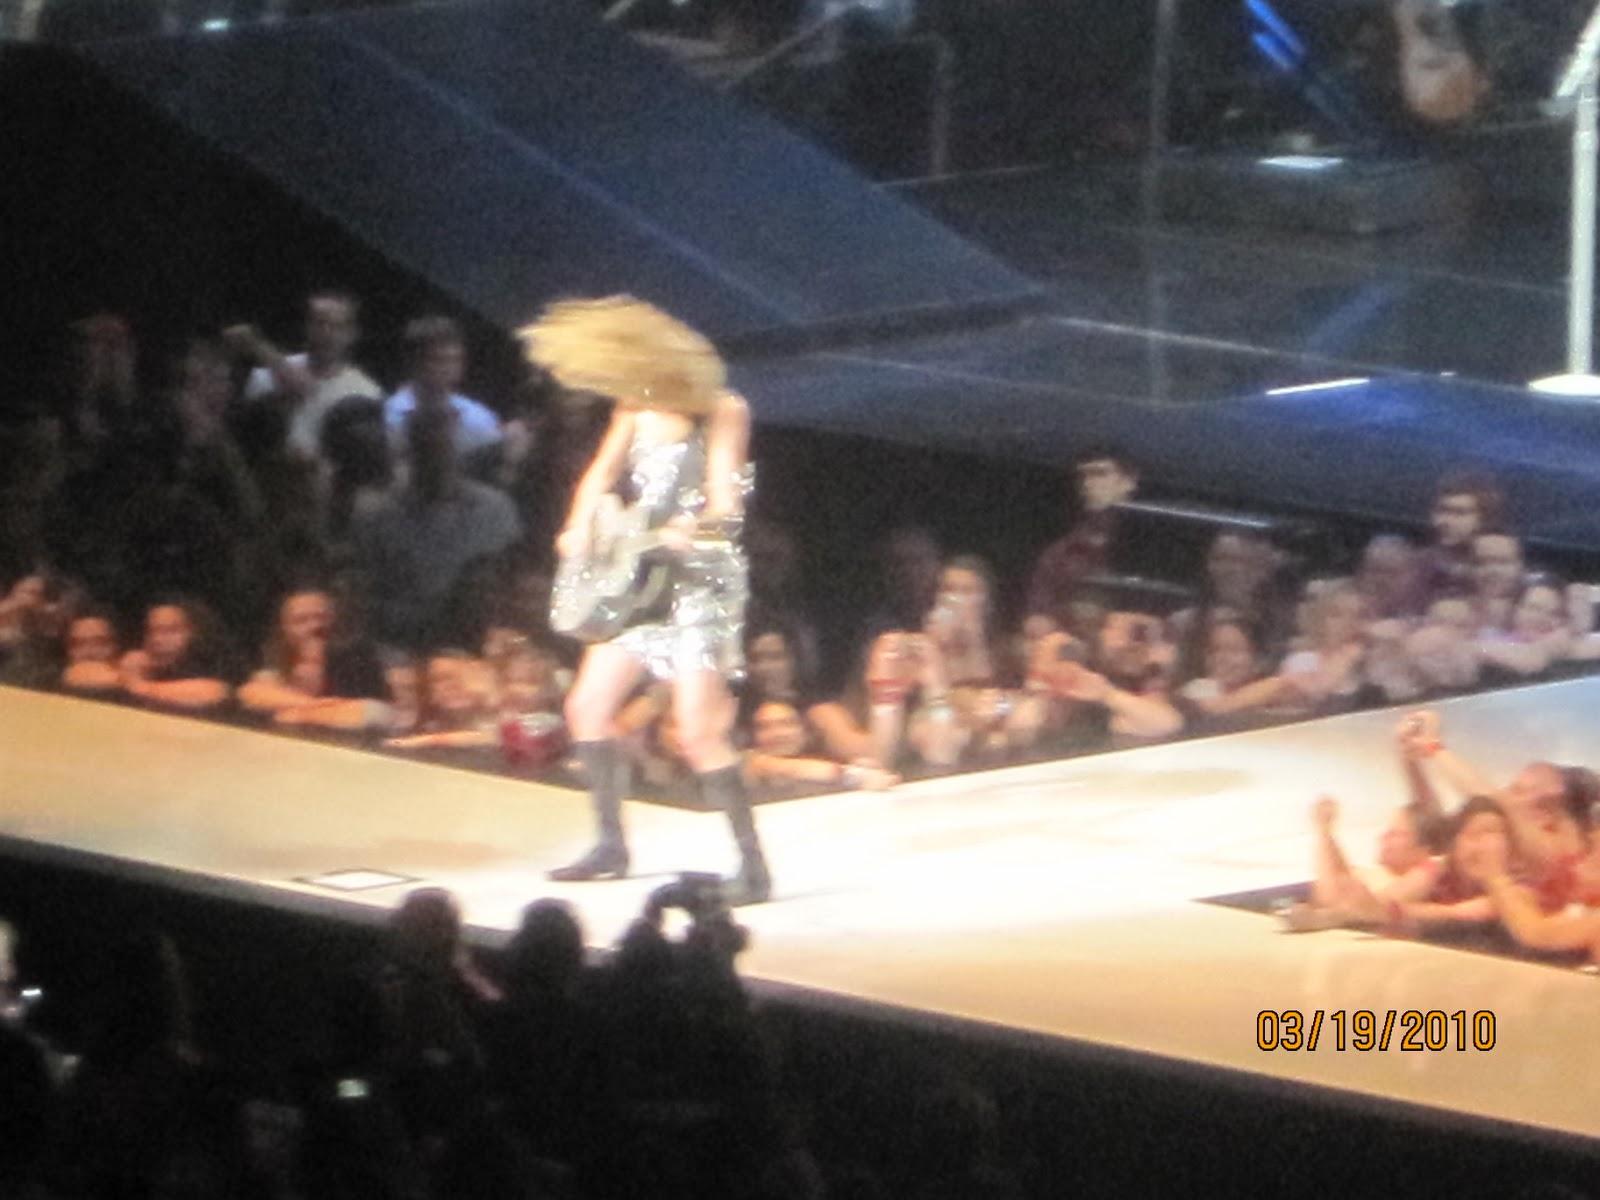 http://3.bp.blogspot.com/_zhQCIcpuWno/TMzspvjSxBI/AAAAAAAAAr4/dqH-UkeLrG4/s1600/Taylor+Swift+Concert+050.jpg